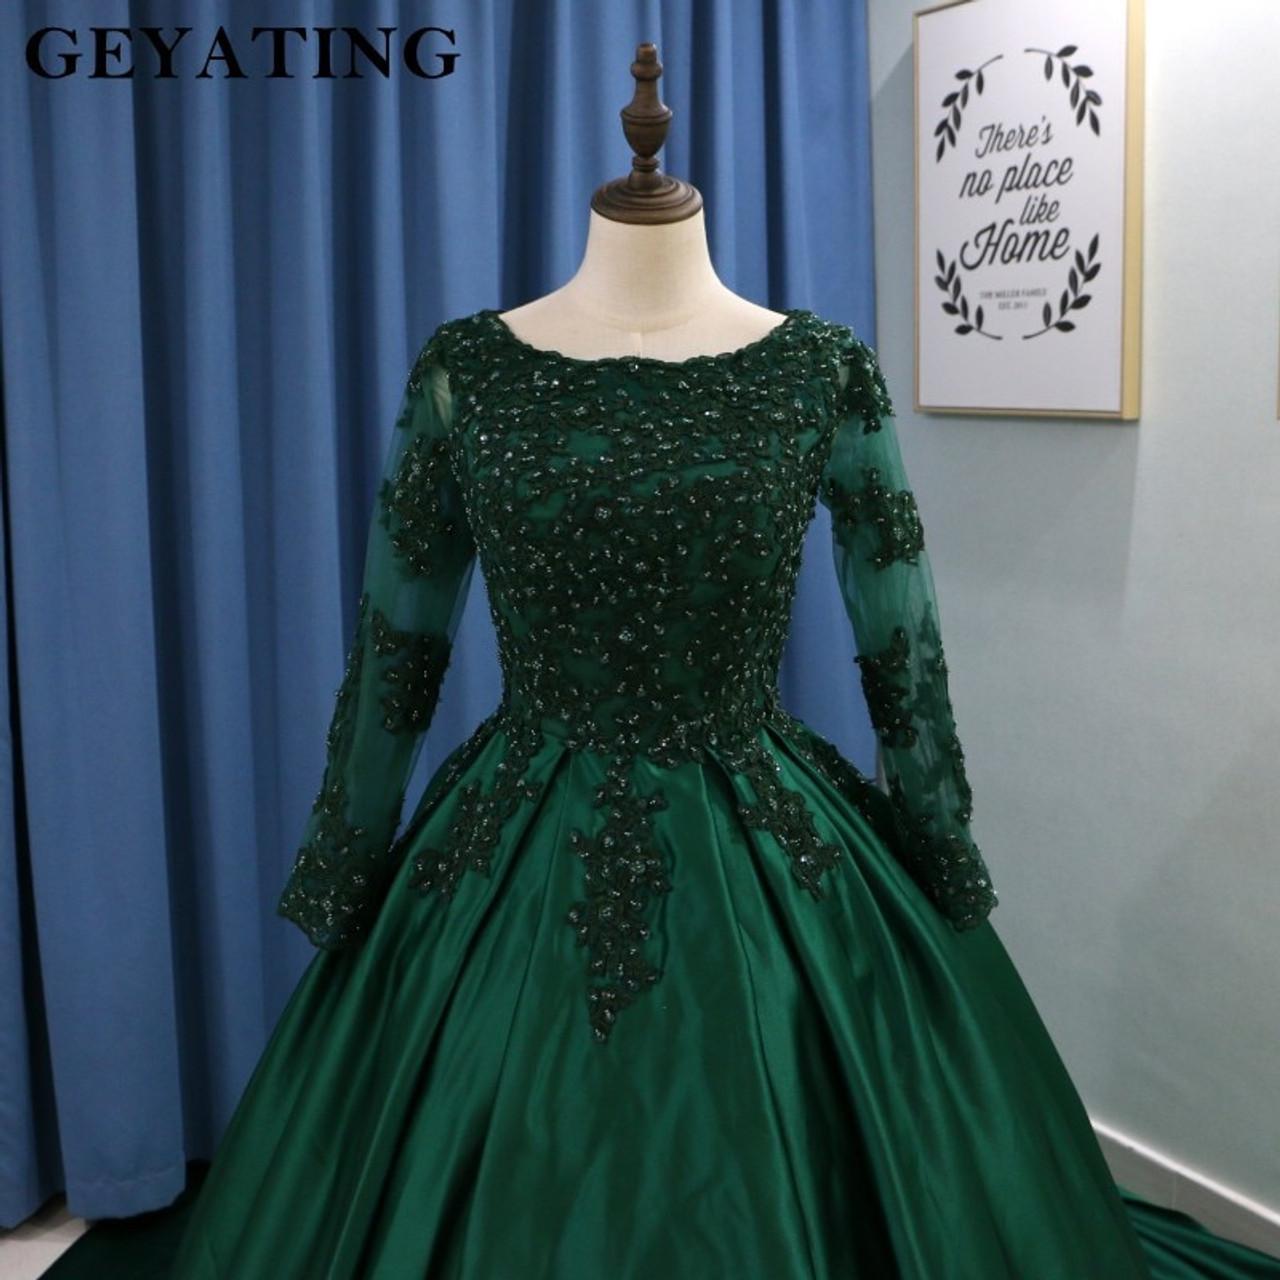 Emerald Green Lace Long Sleeves Muslim Wedding Dress 2018 Ball Gown  Princess Bride Dresses Islamic Satin Court Train Bridal Gown